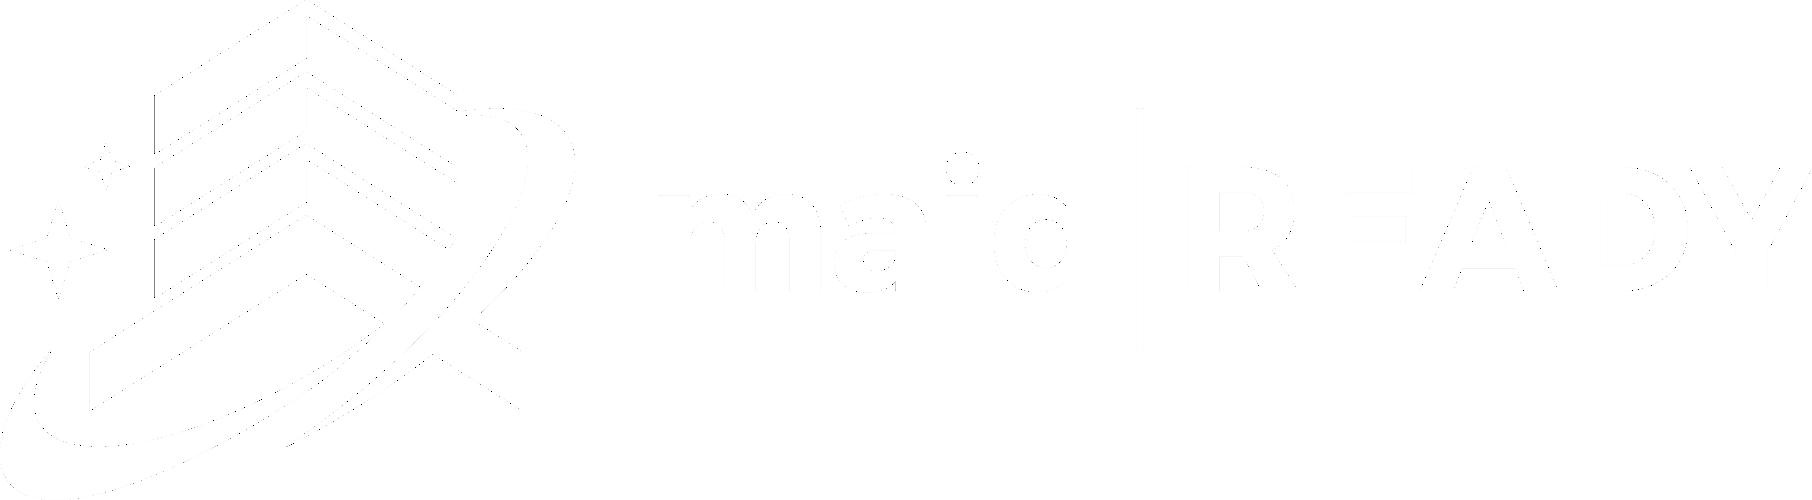 maidREADY